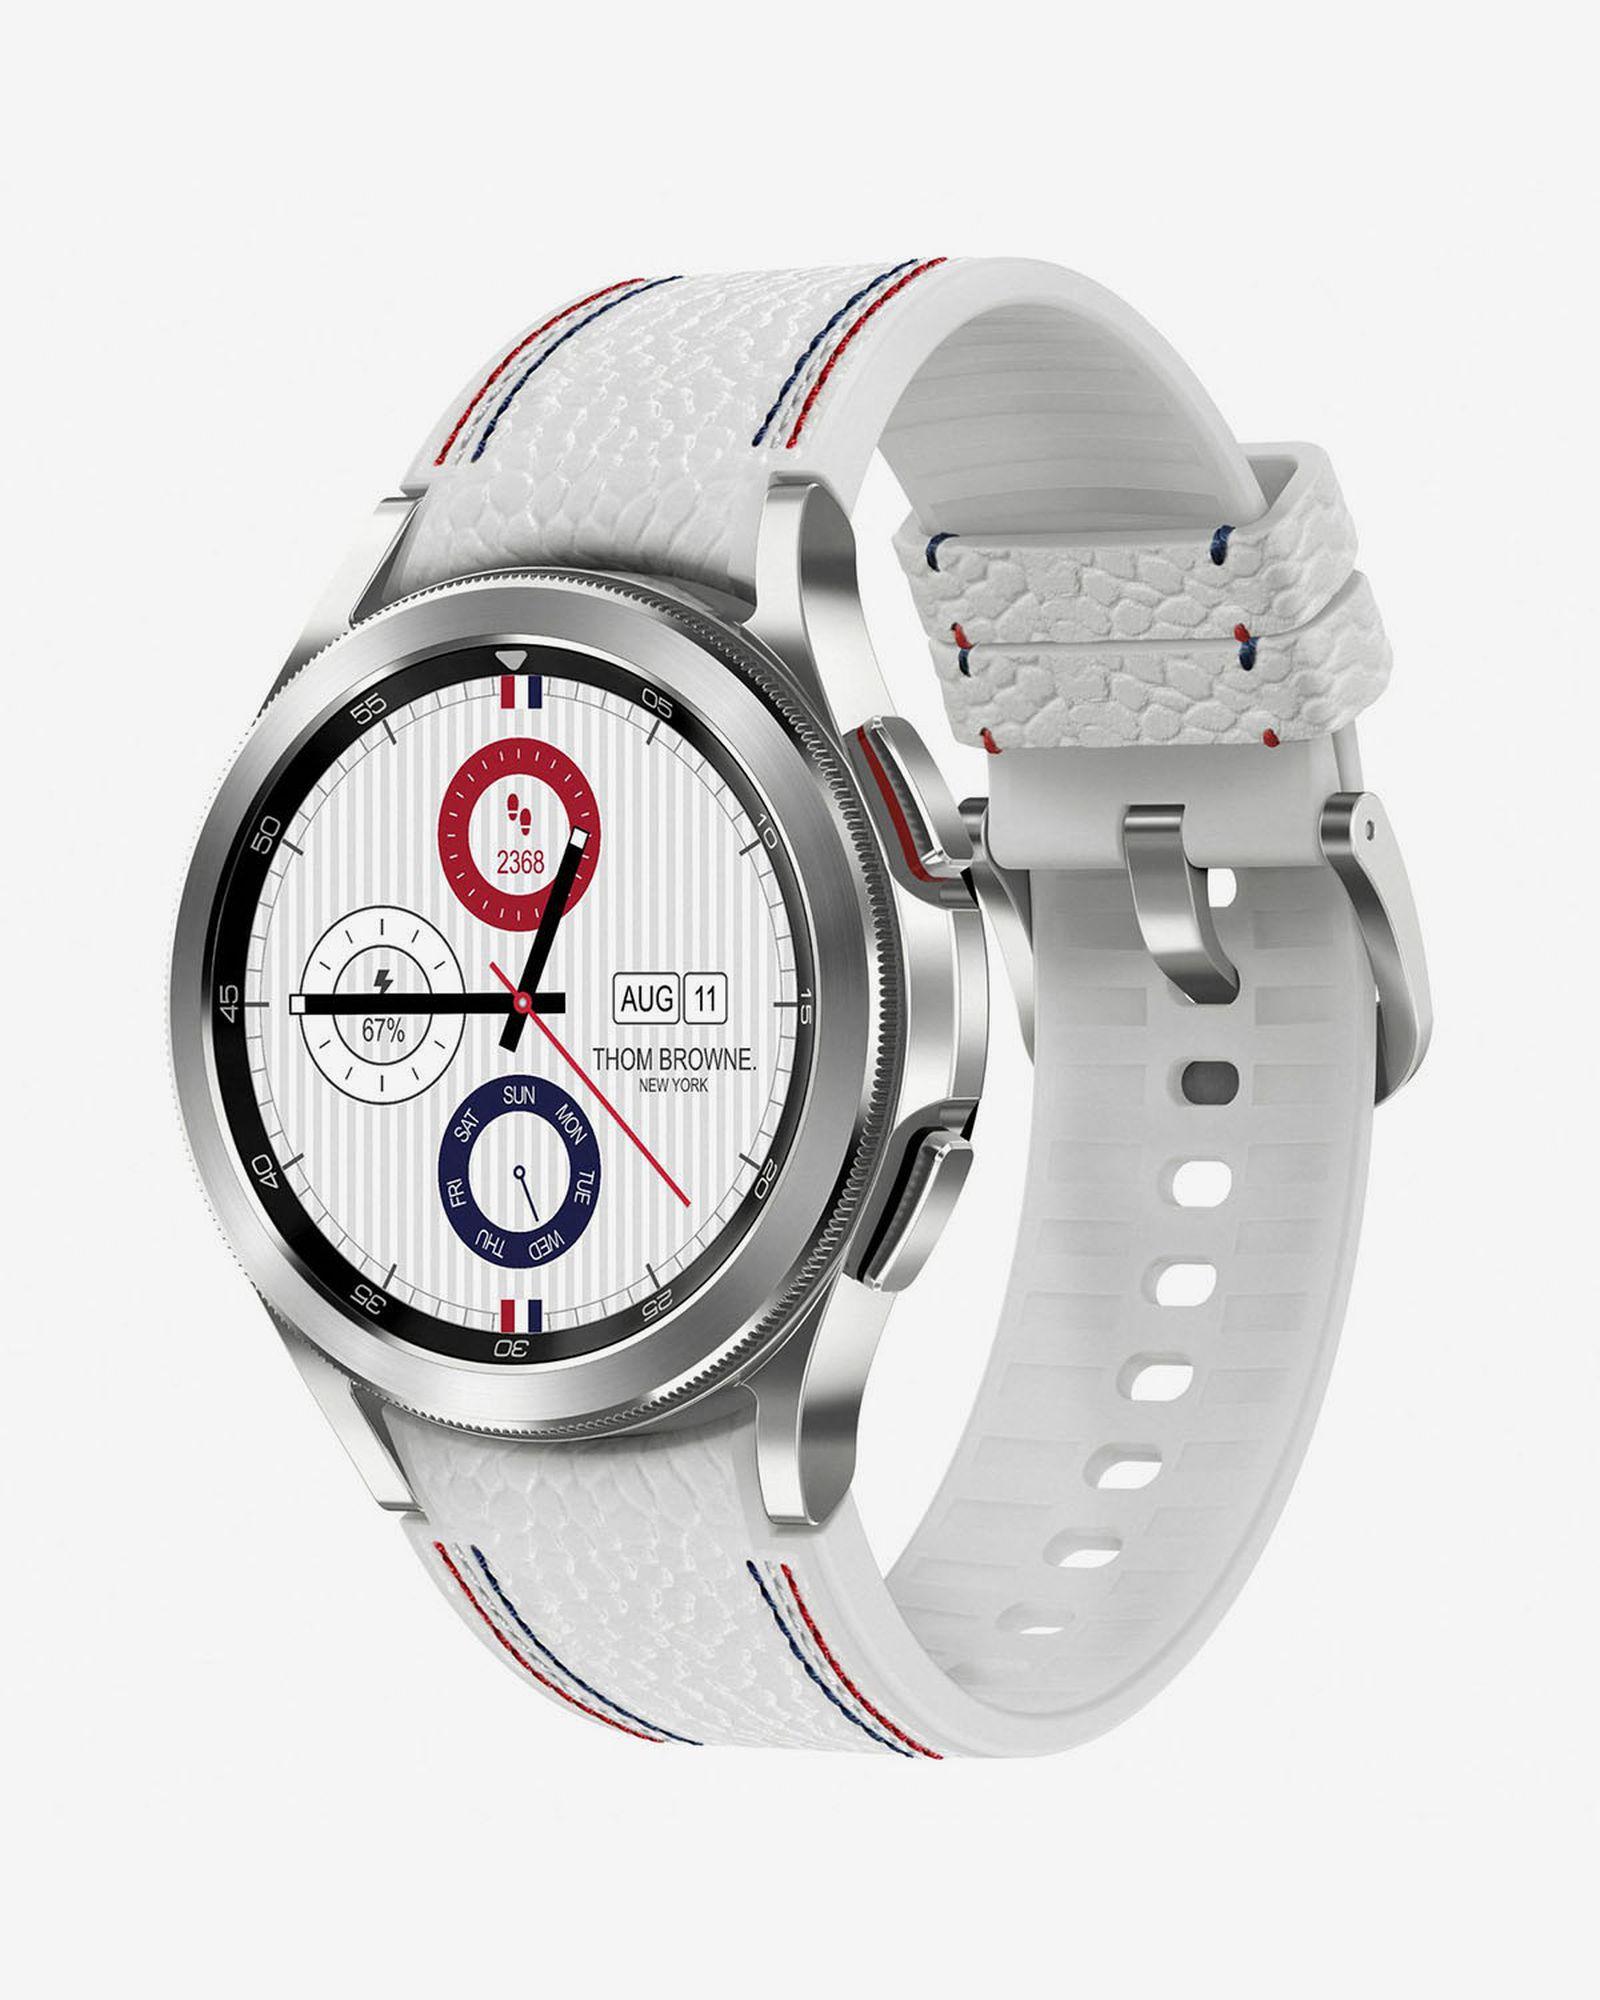 thom-browne-samsung-watch-04